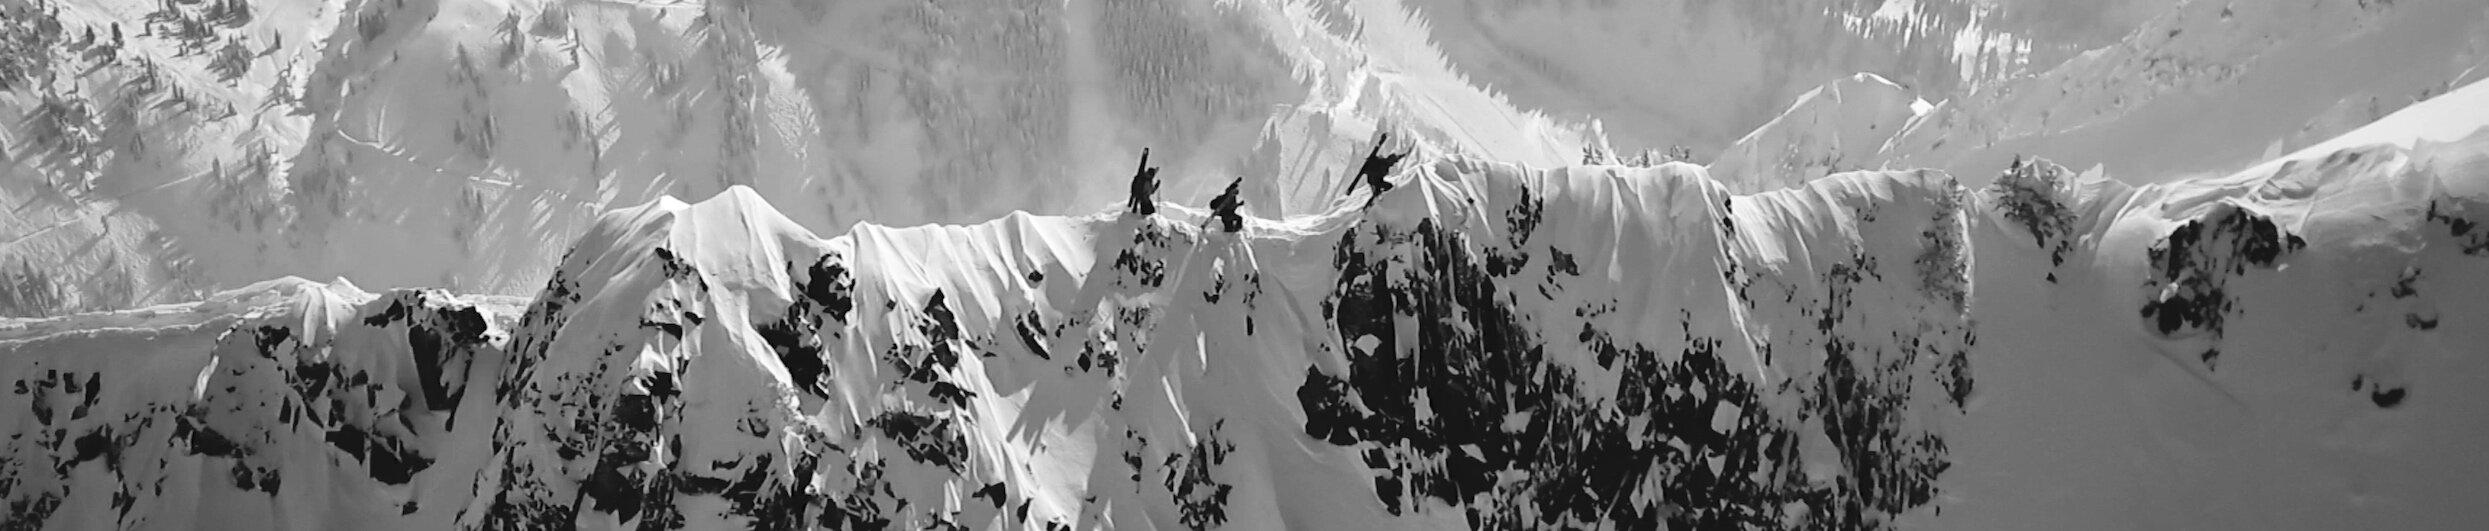 The-Fifty-Episode 2 - Screen Shot Ridge Walk.jpg